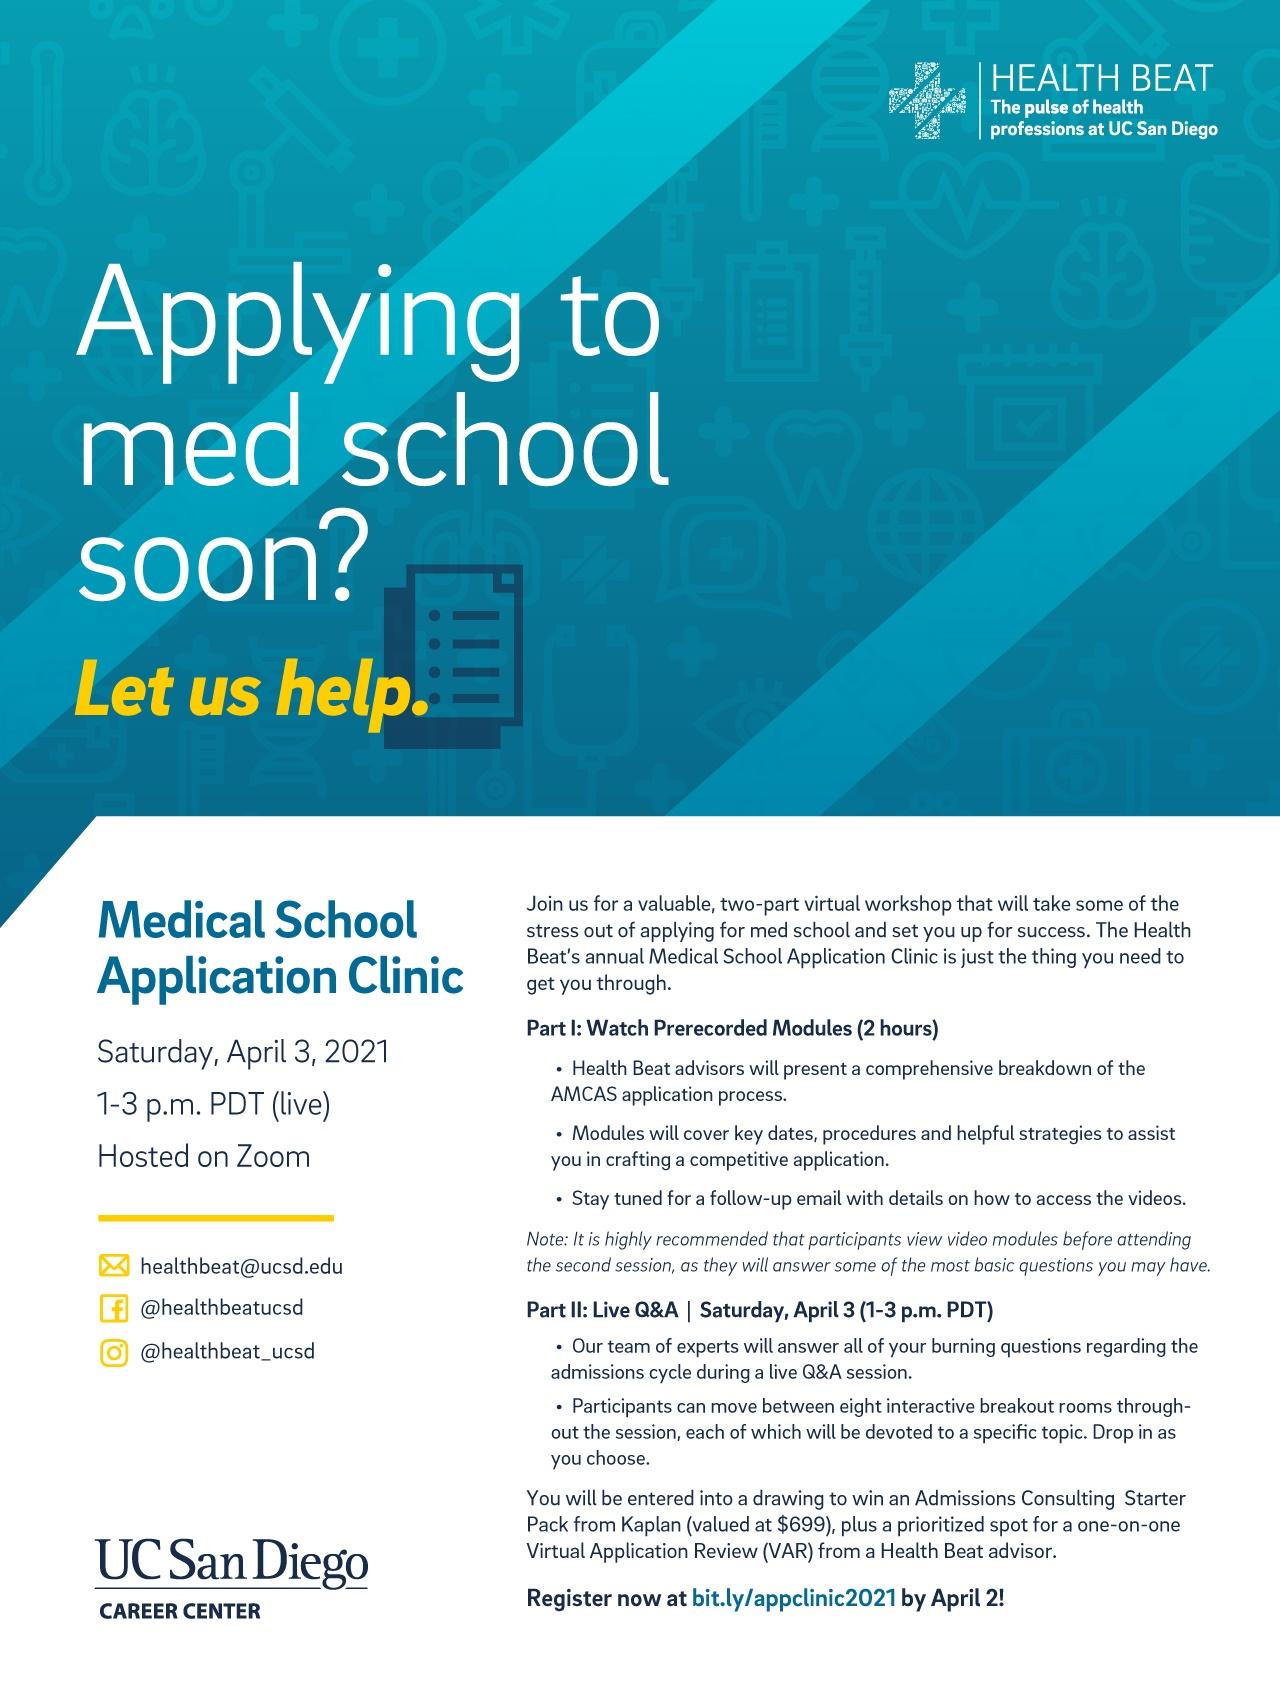 Medical School Application Clinic 2021